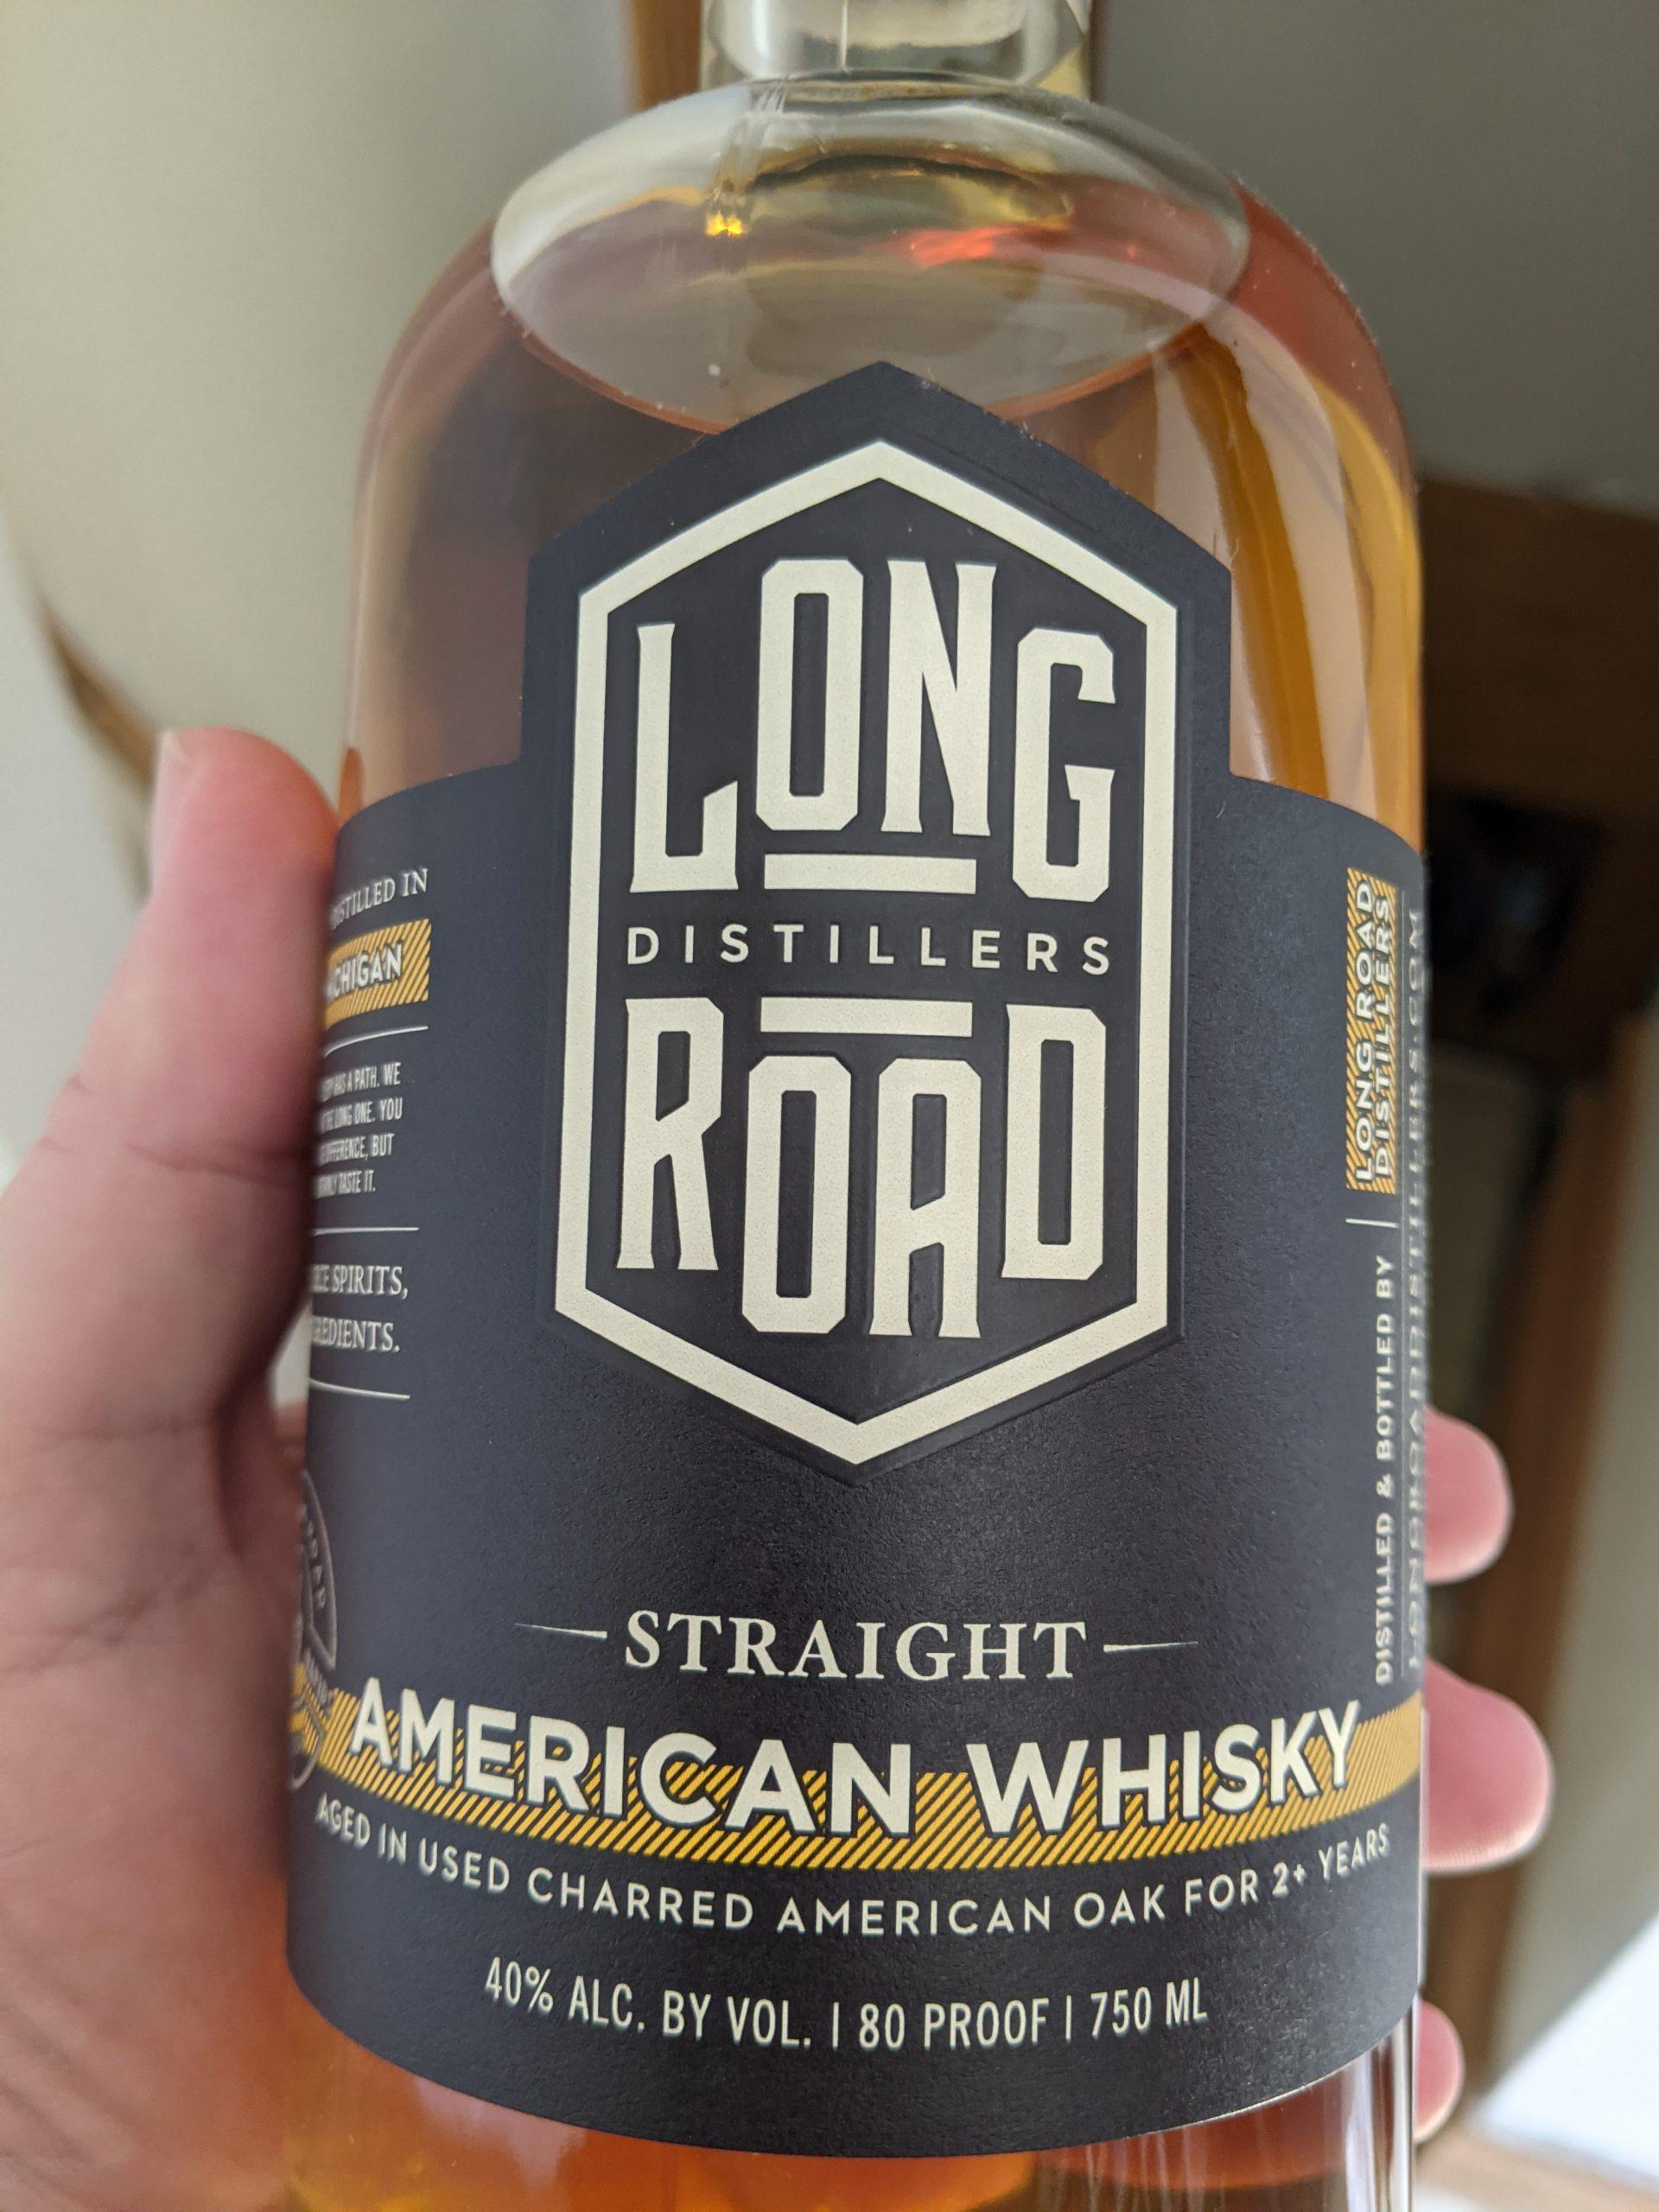 Long Road Straigher American Whiskey